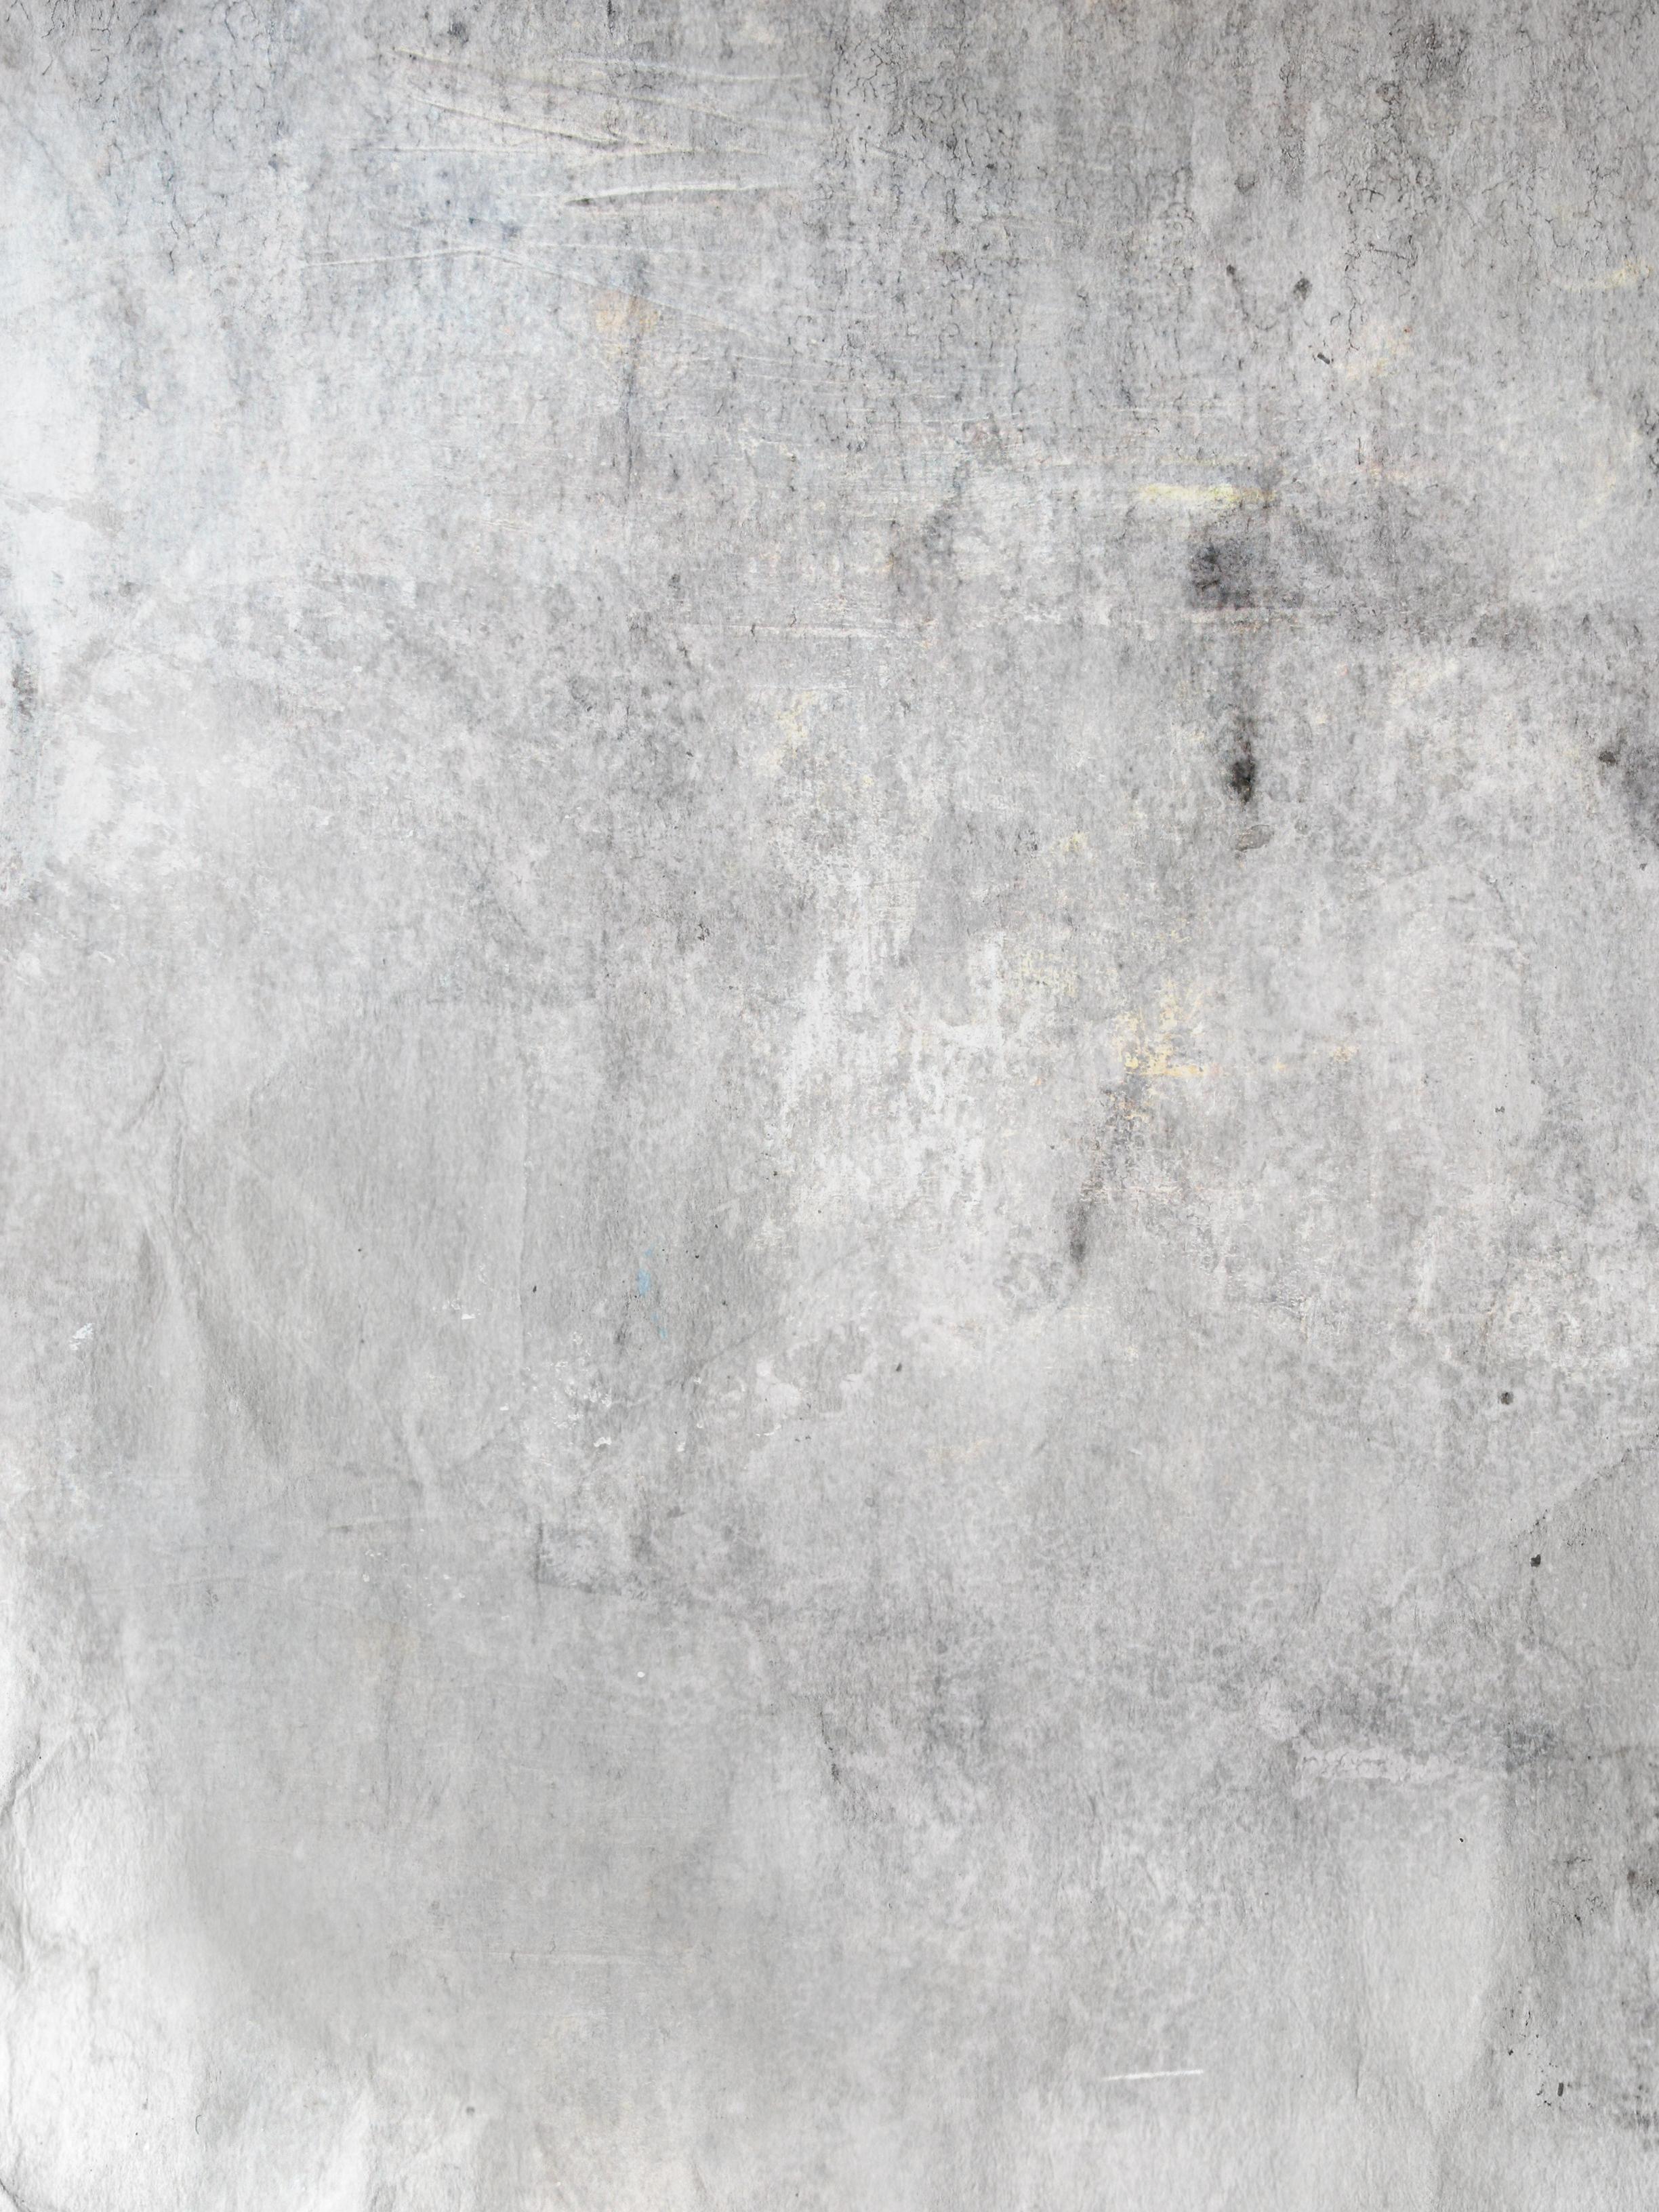 Free Subtle Grey Grunge Texture Texture - L+T